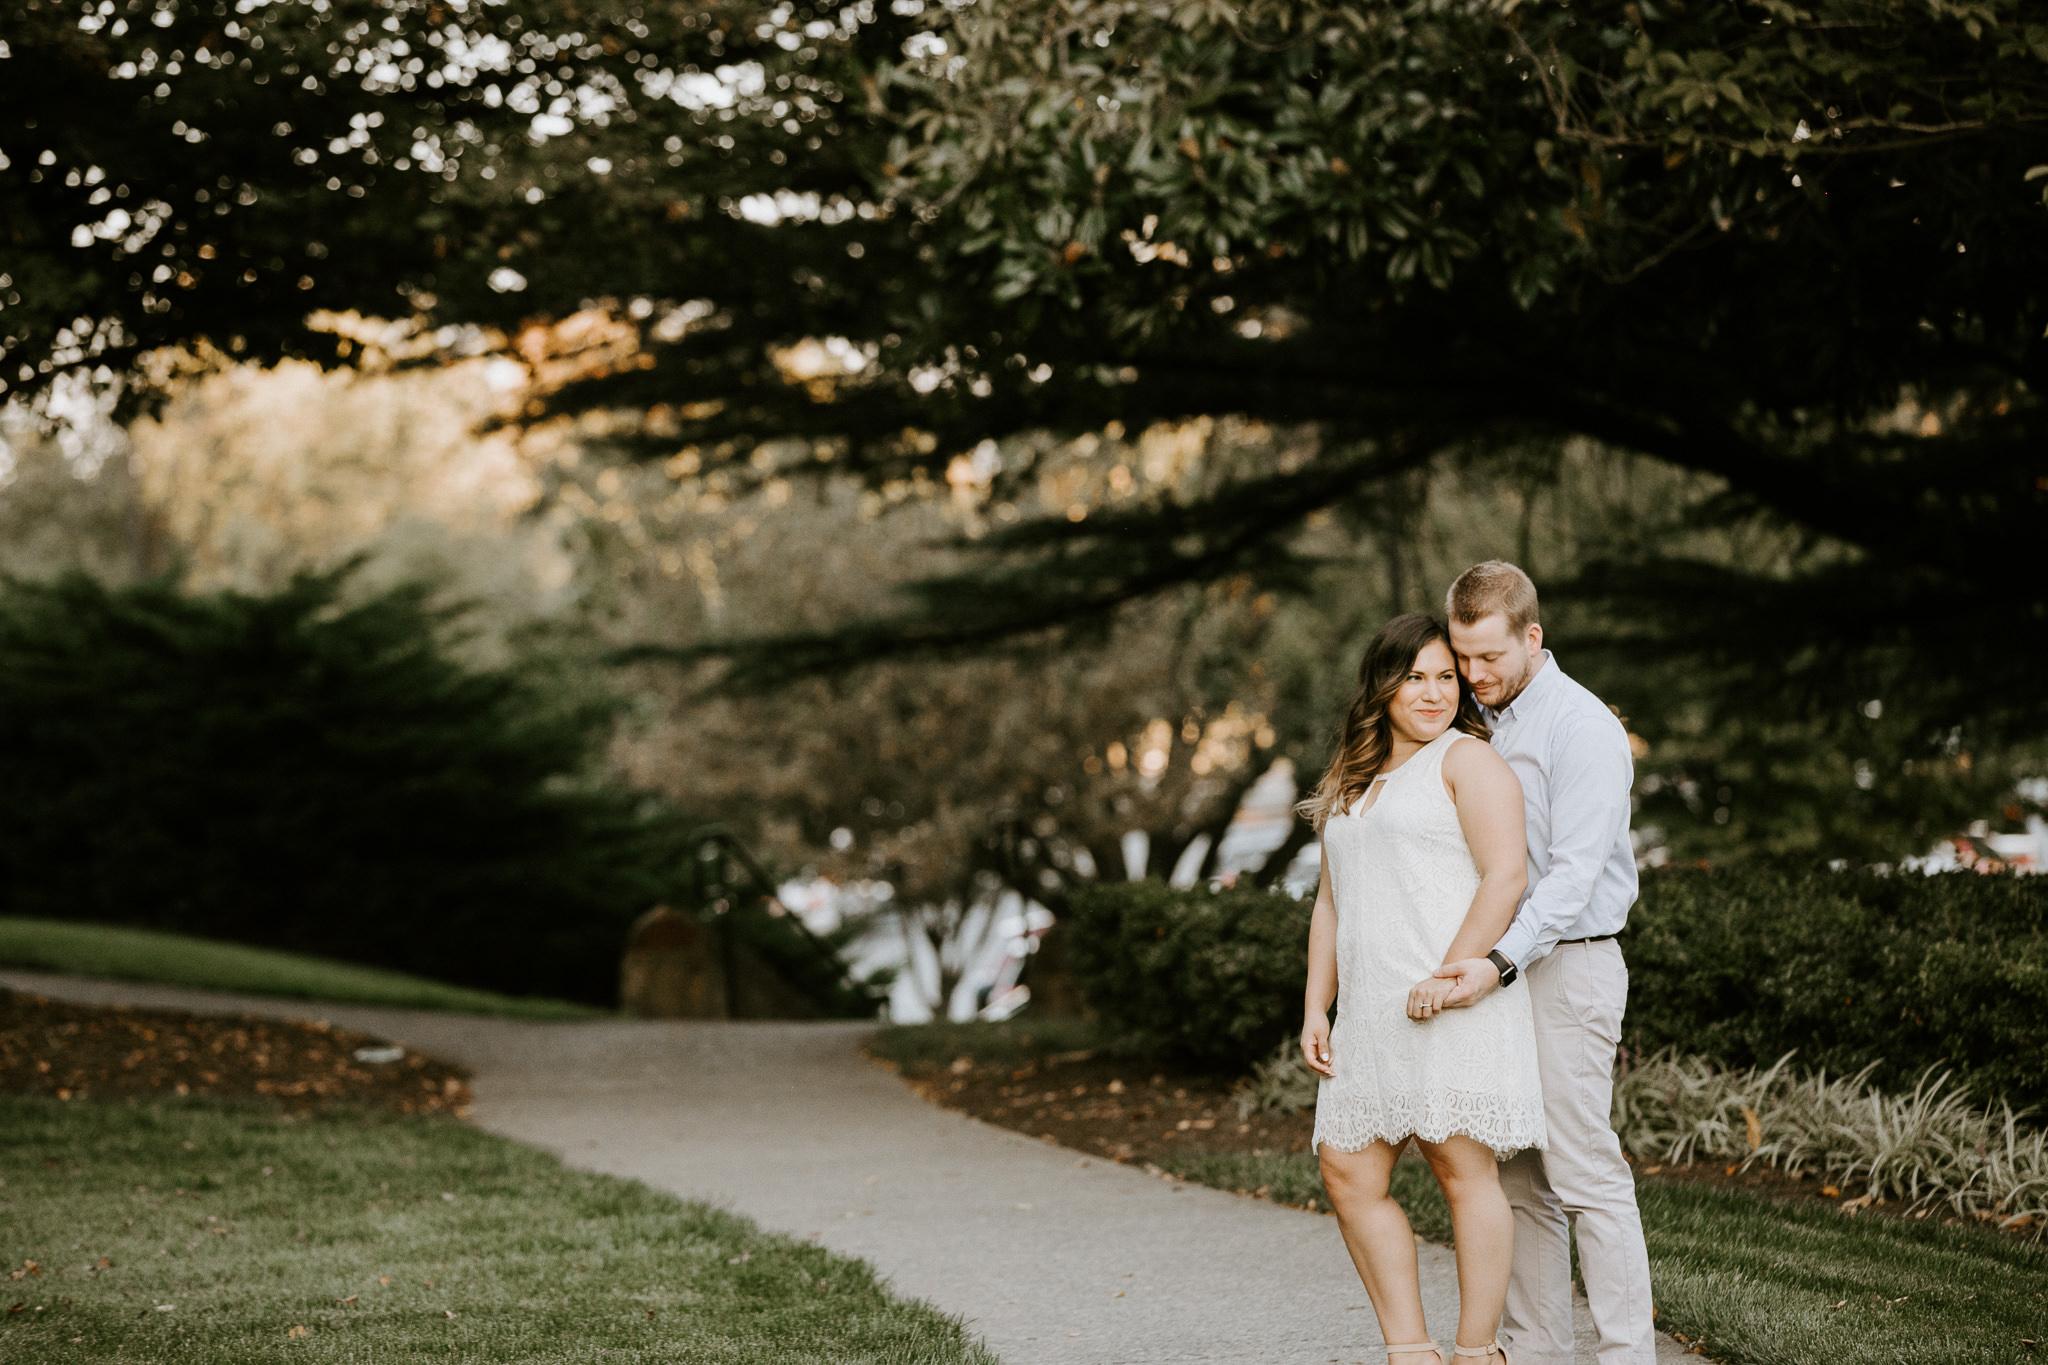 Engagement - Downtown Roanoke -  Wedding Photographer - Virginia - Best - Pat Cori Photography-21.jpg